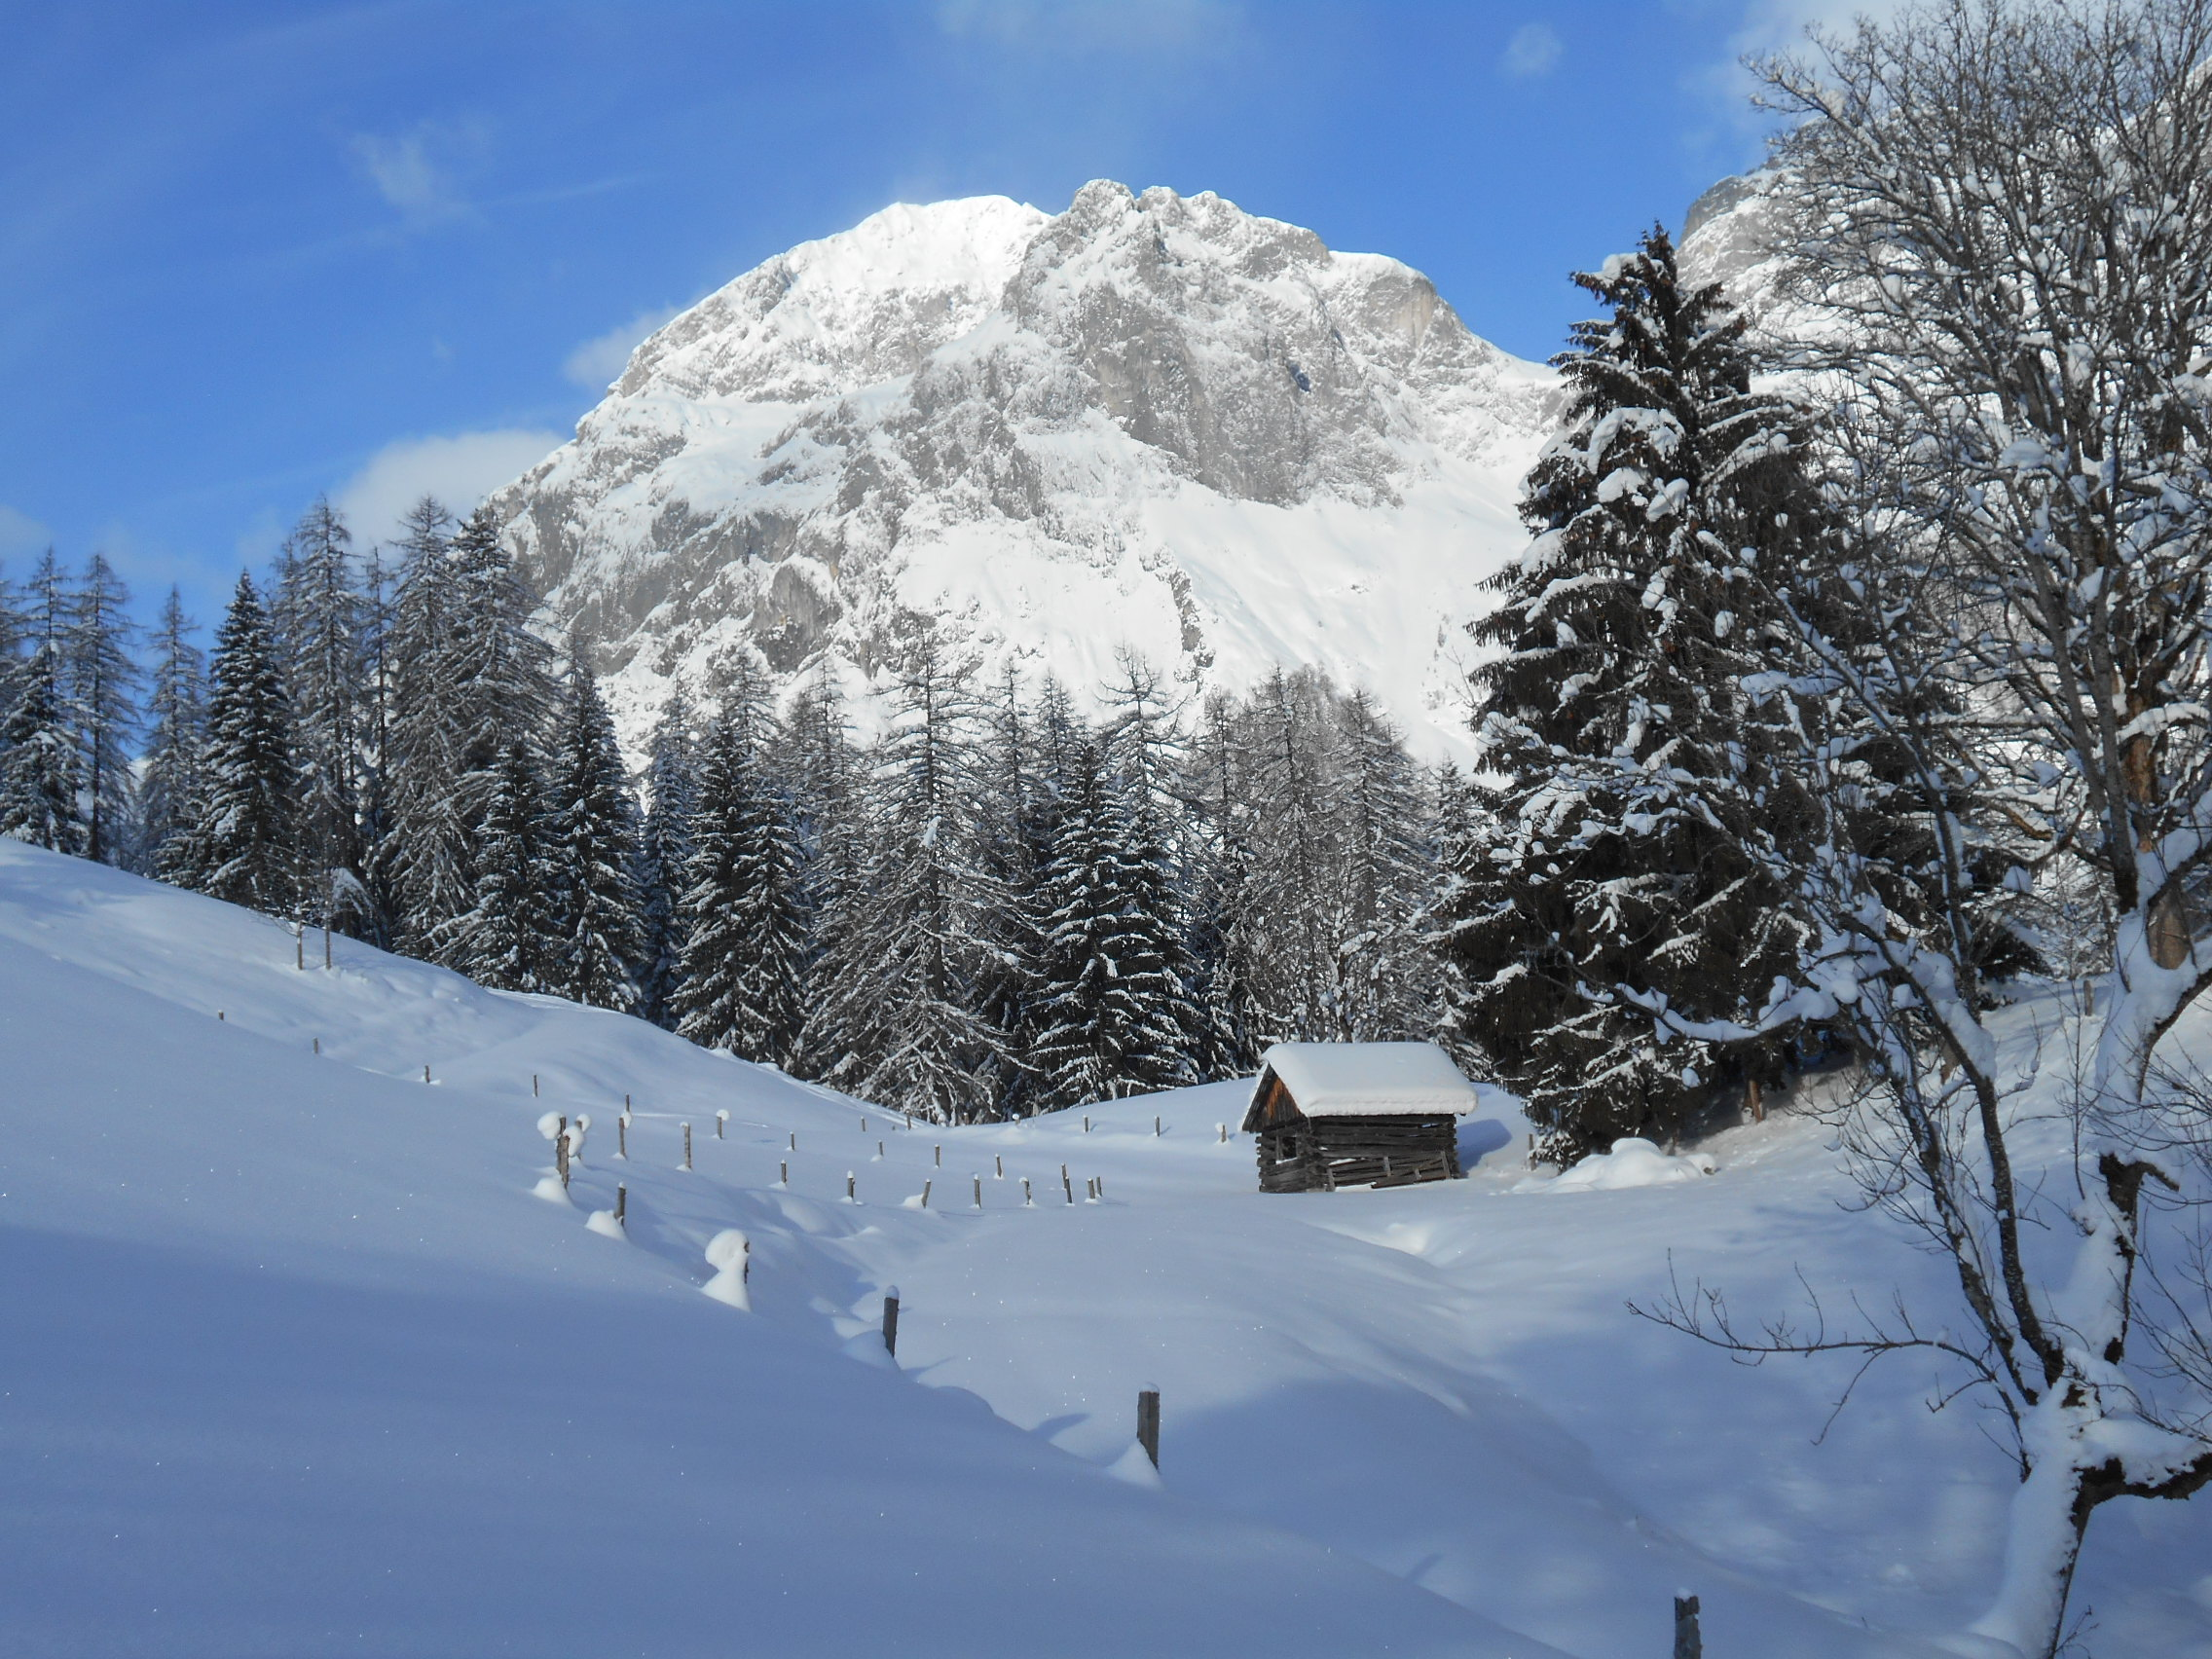 Schneeschuhwanderung 2016 01 19 4 laemmerhof 39 s blog for Fischteich im winter